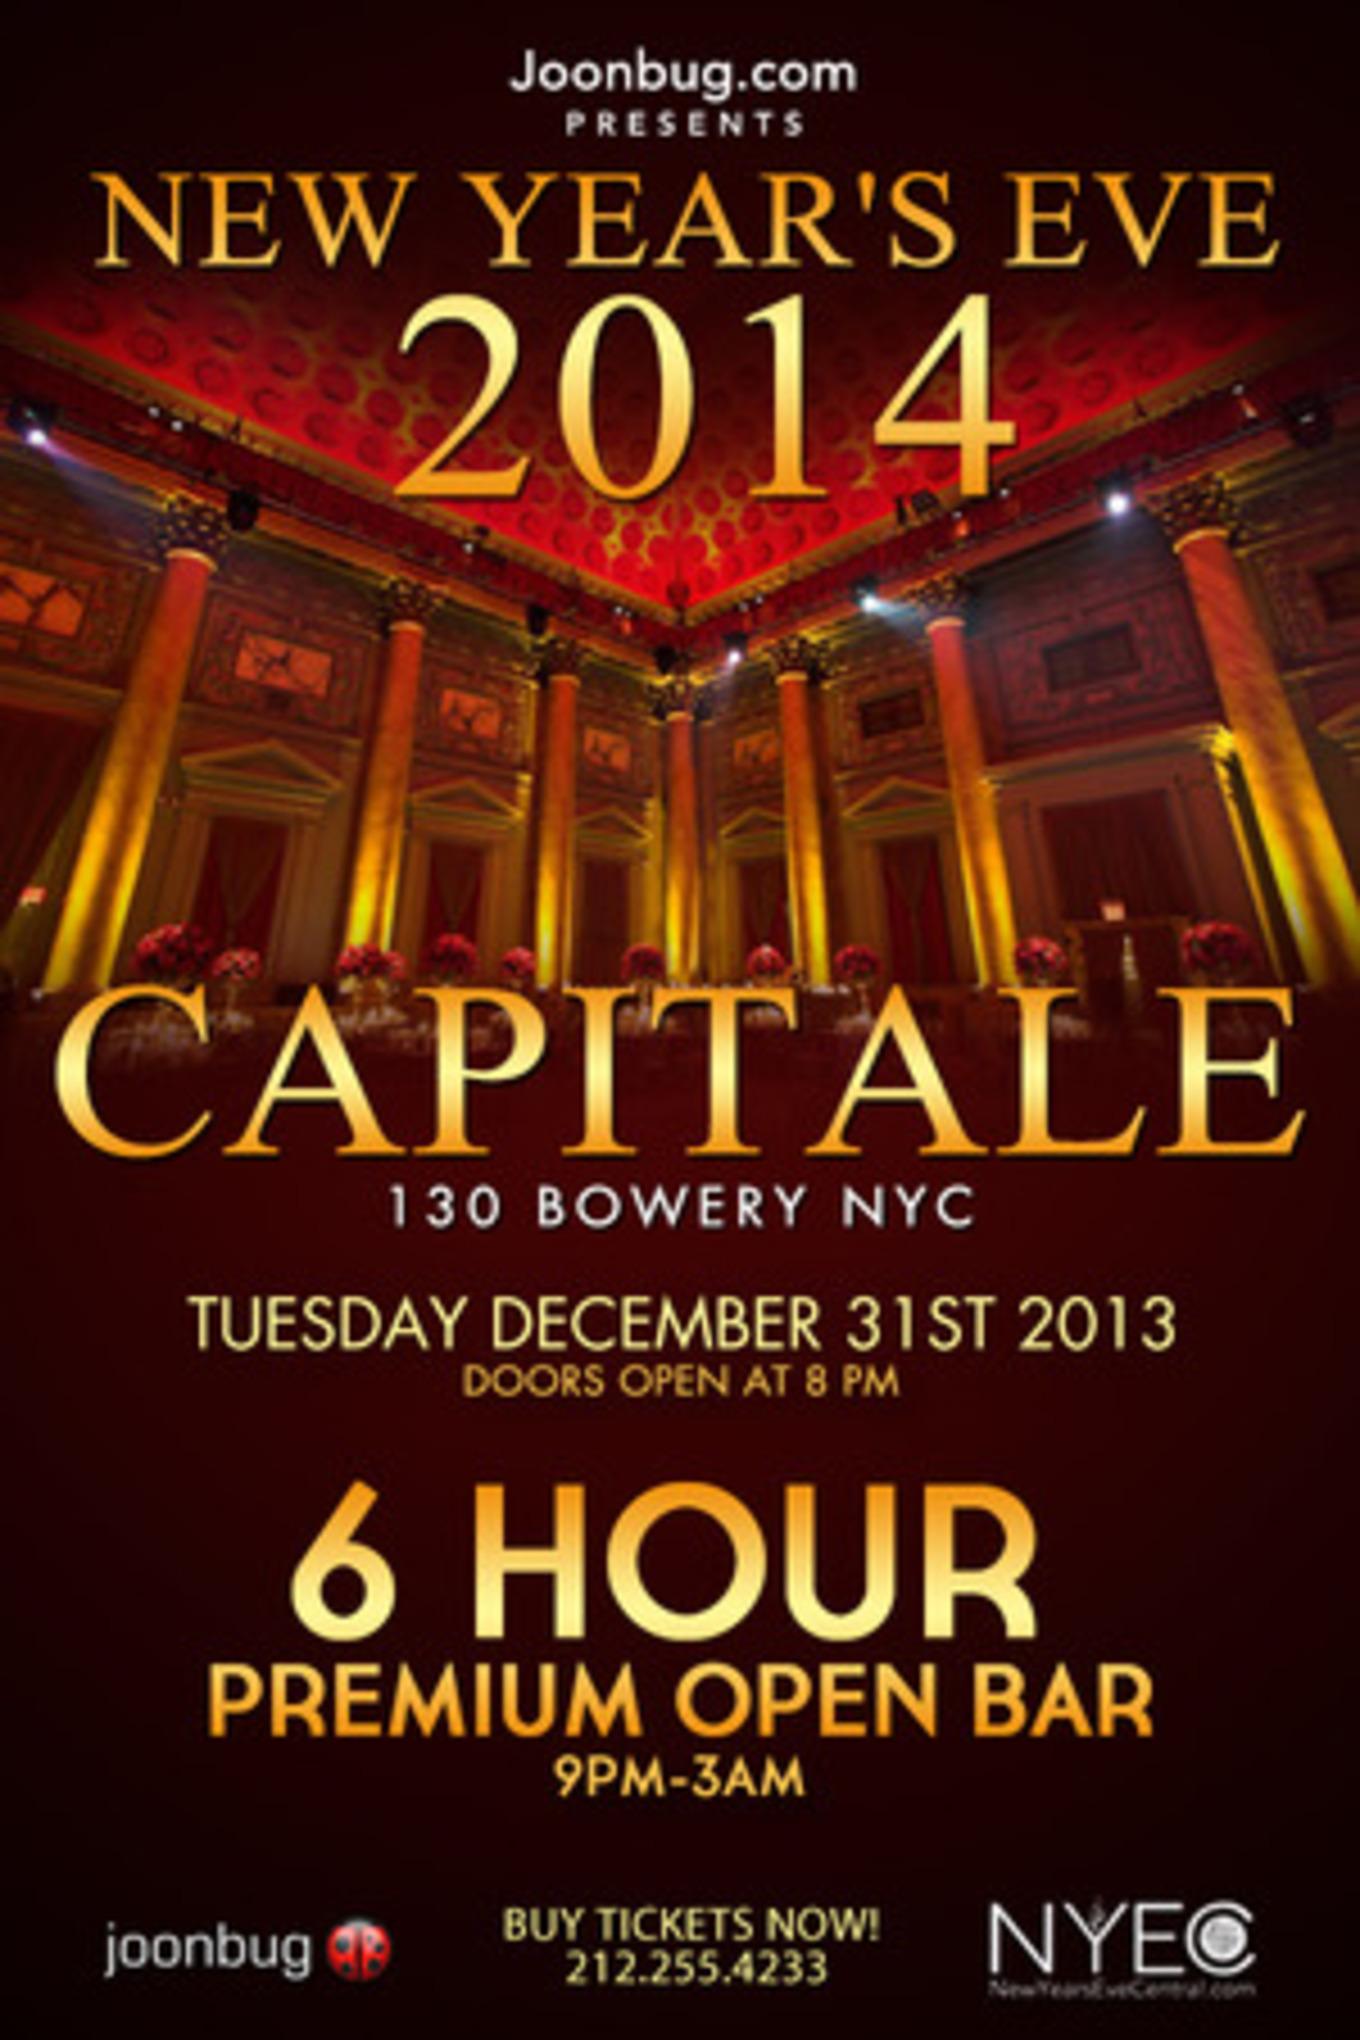 Capitale New Years Eve 2014